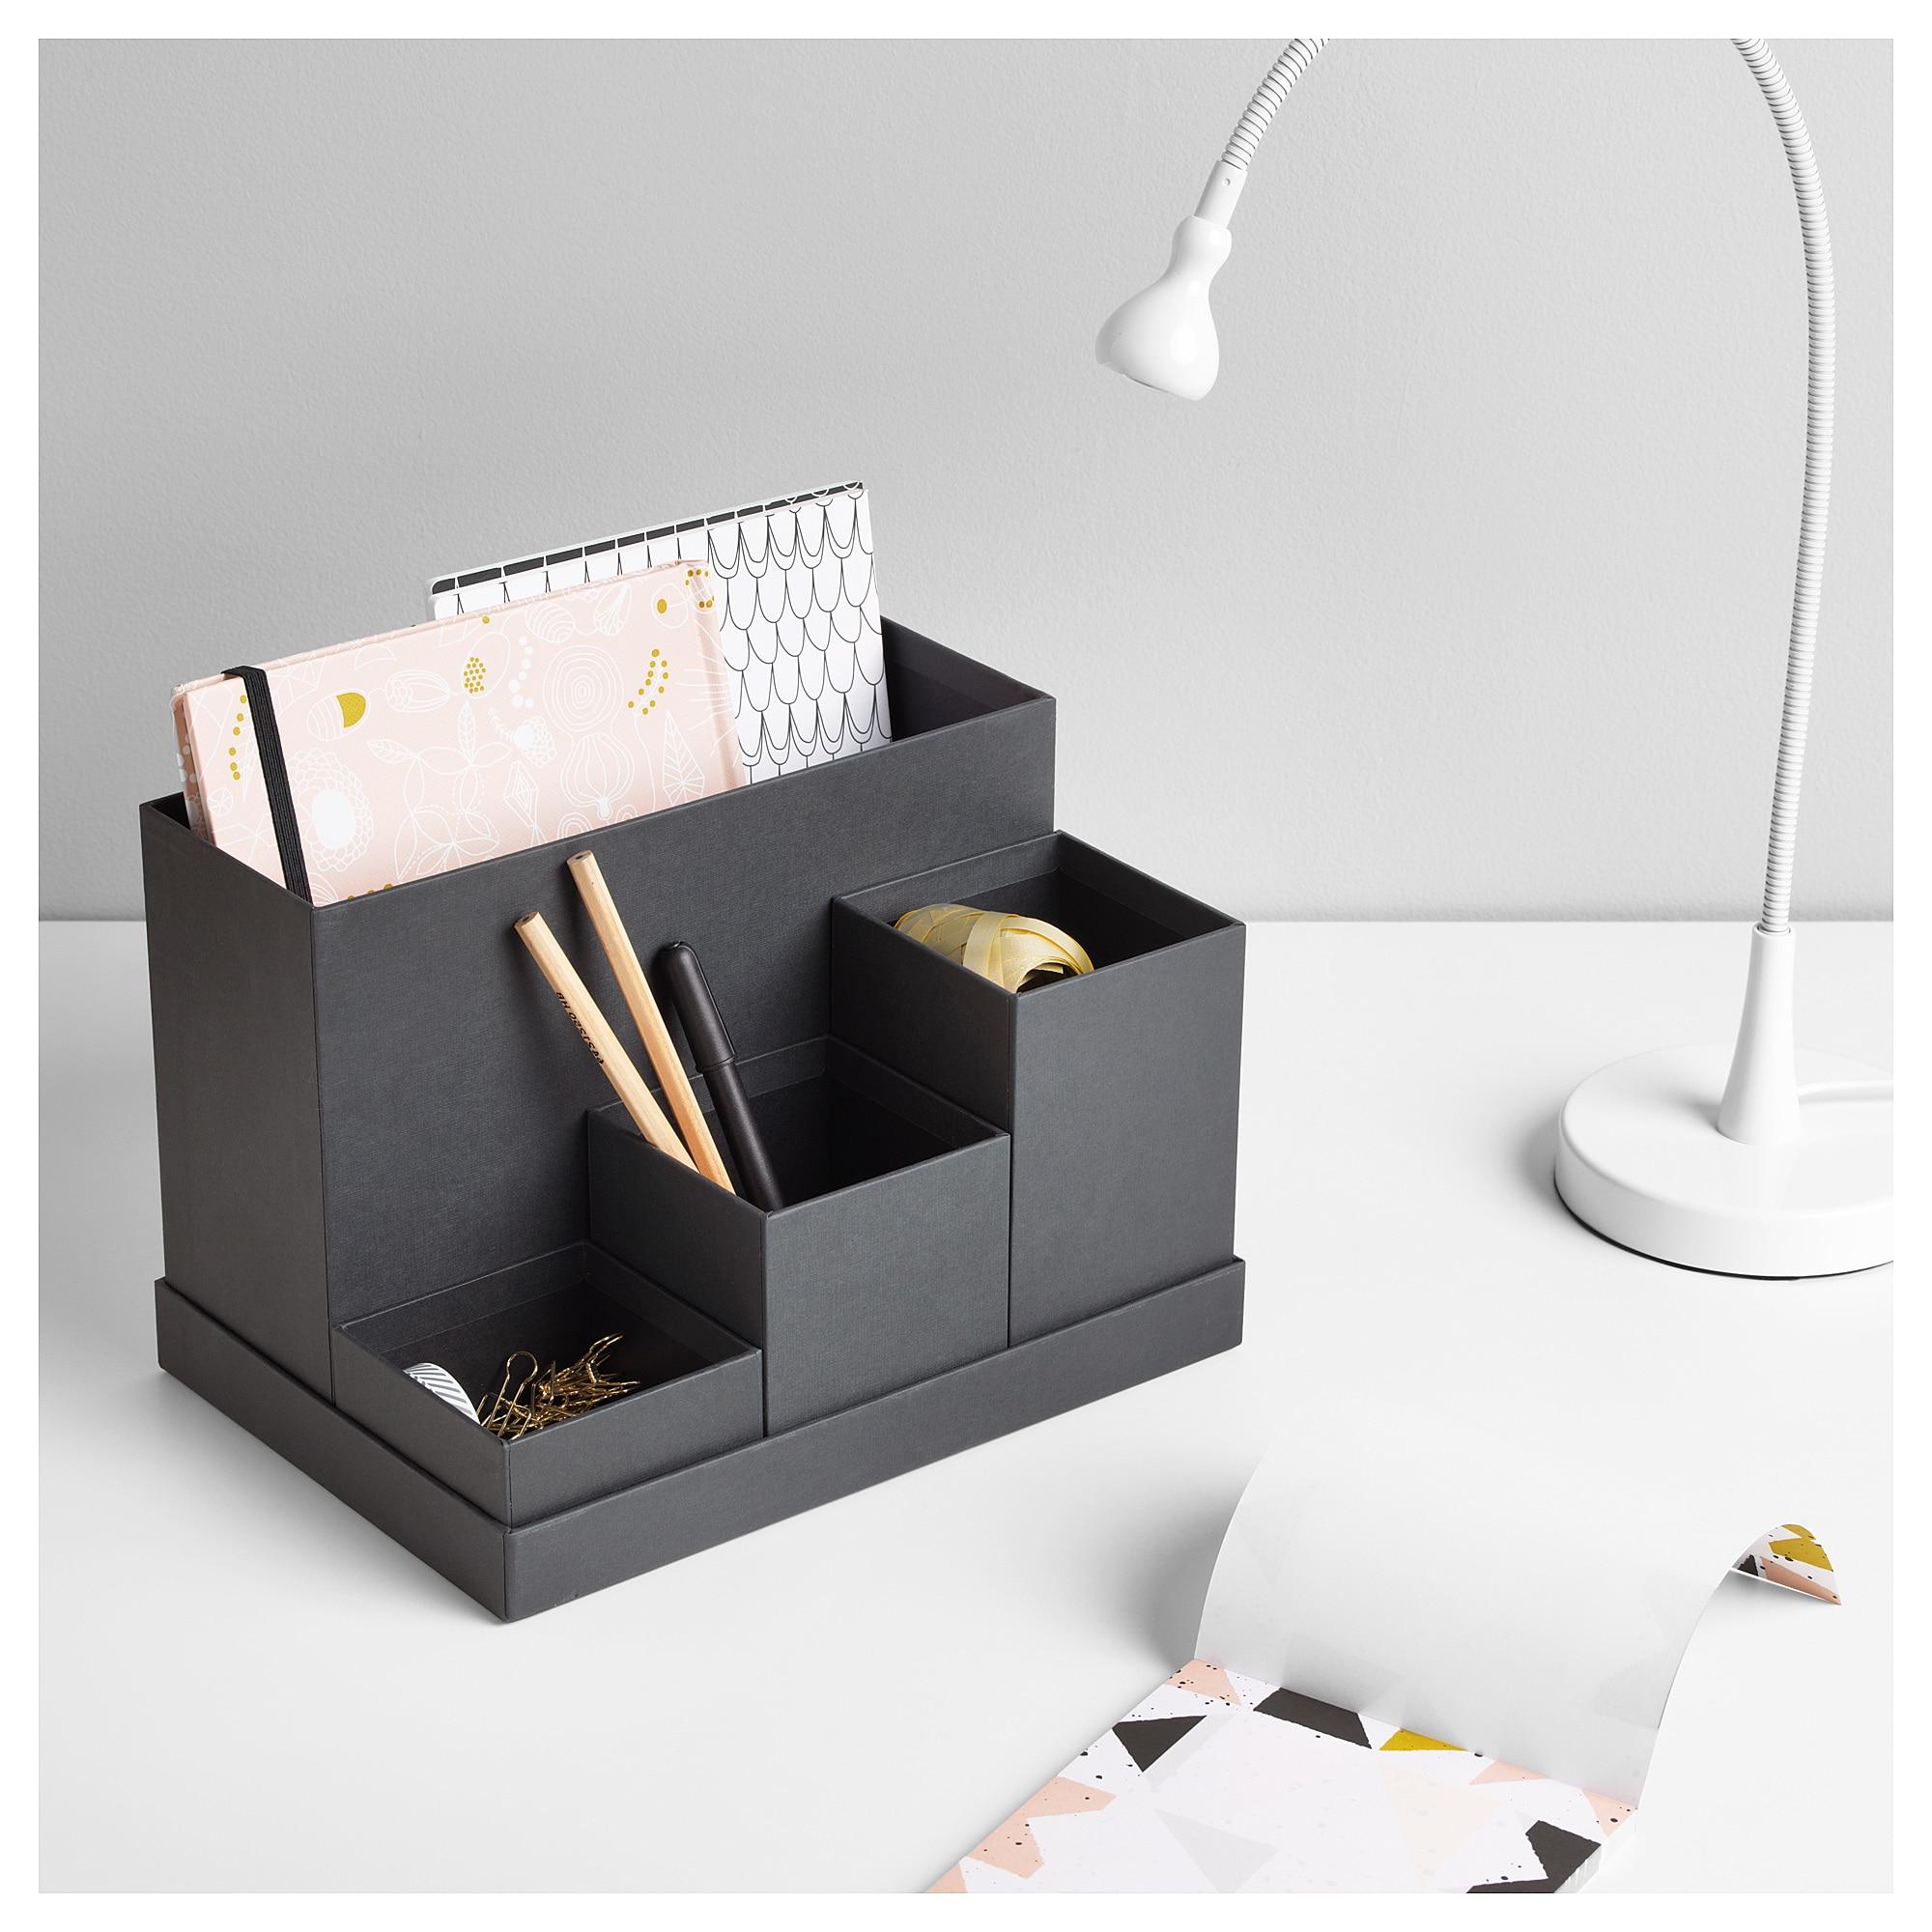 Ikea organizador Escritorio Gdd0 Tjena organizador Escritorio Negro 18 X 17 Cm Ikea